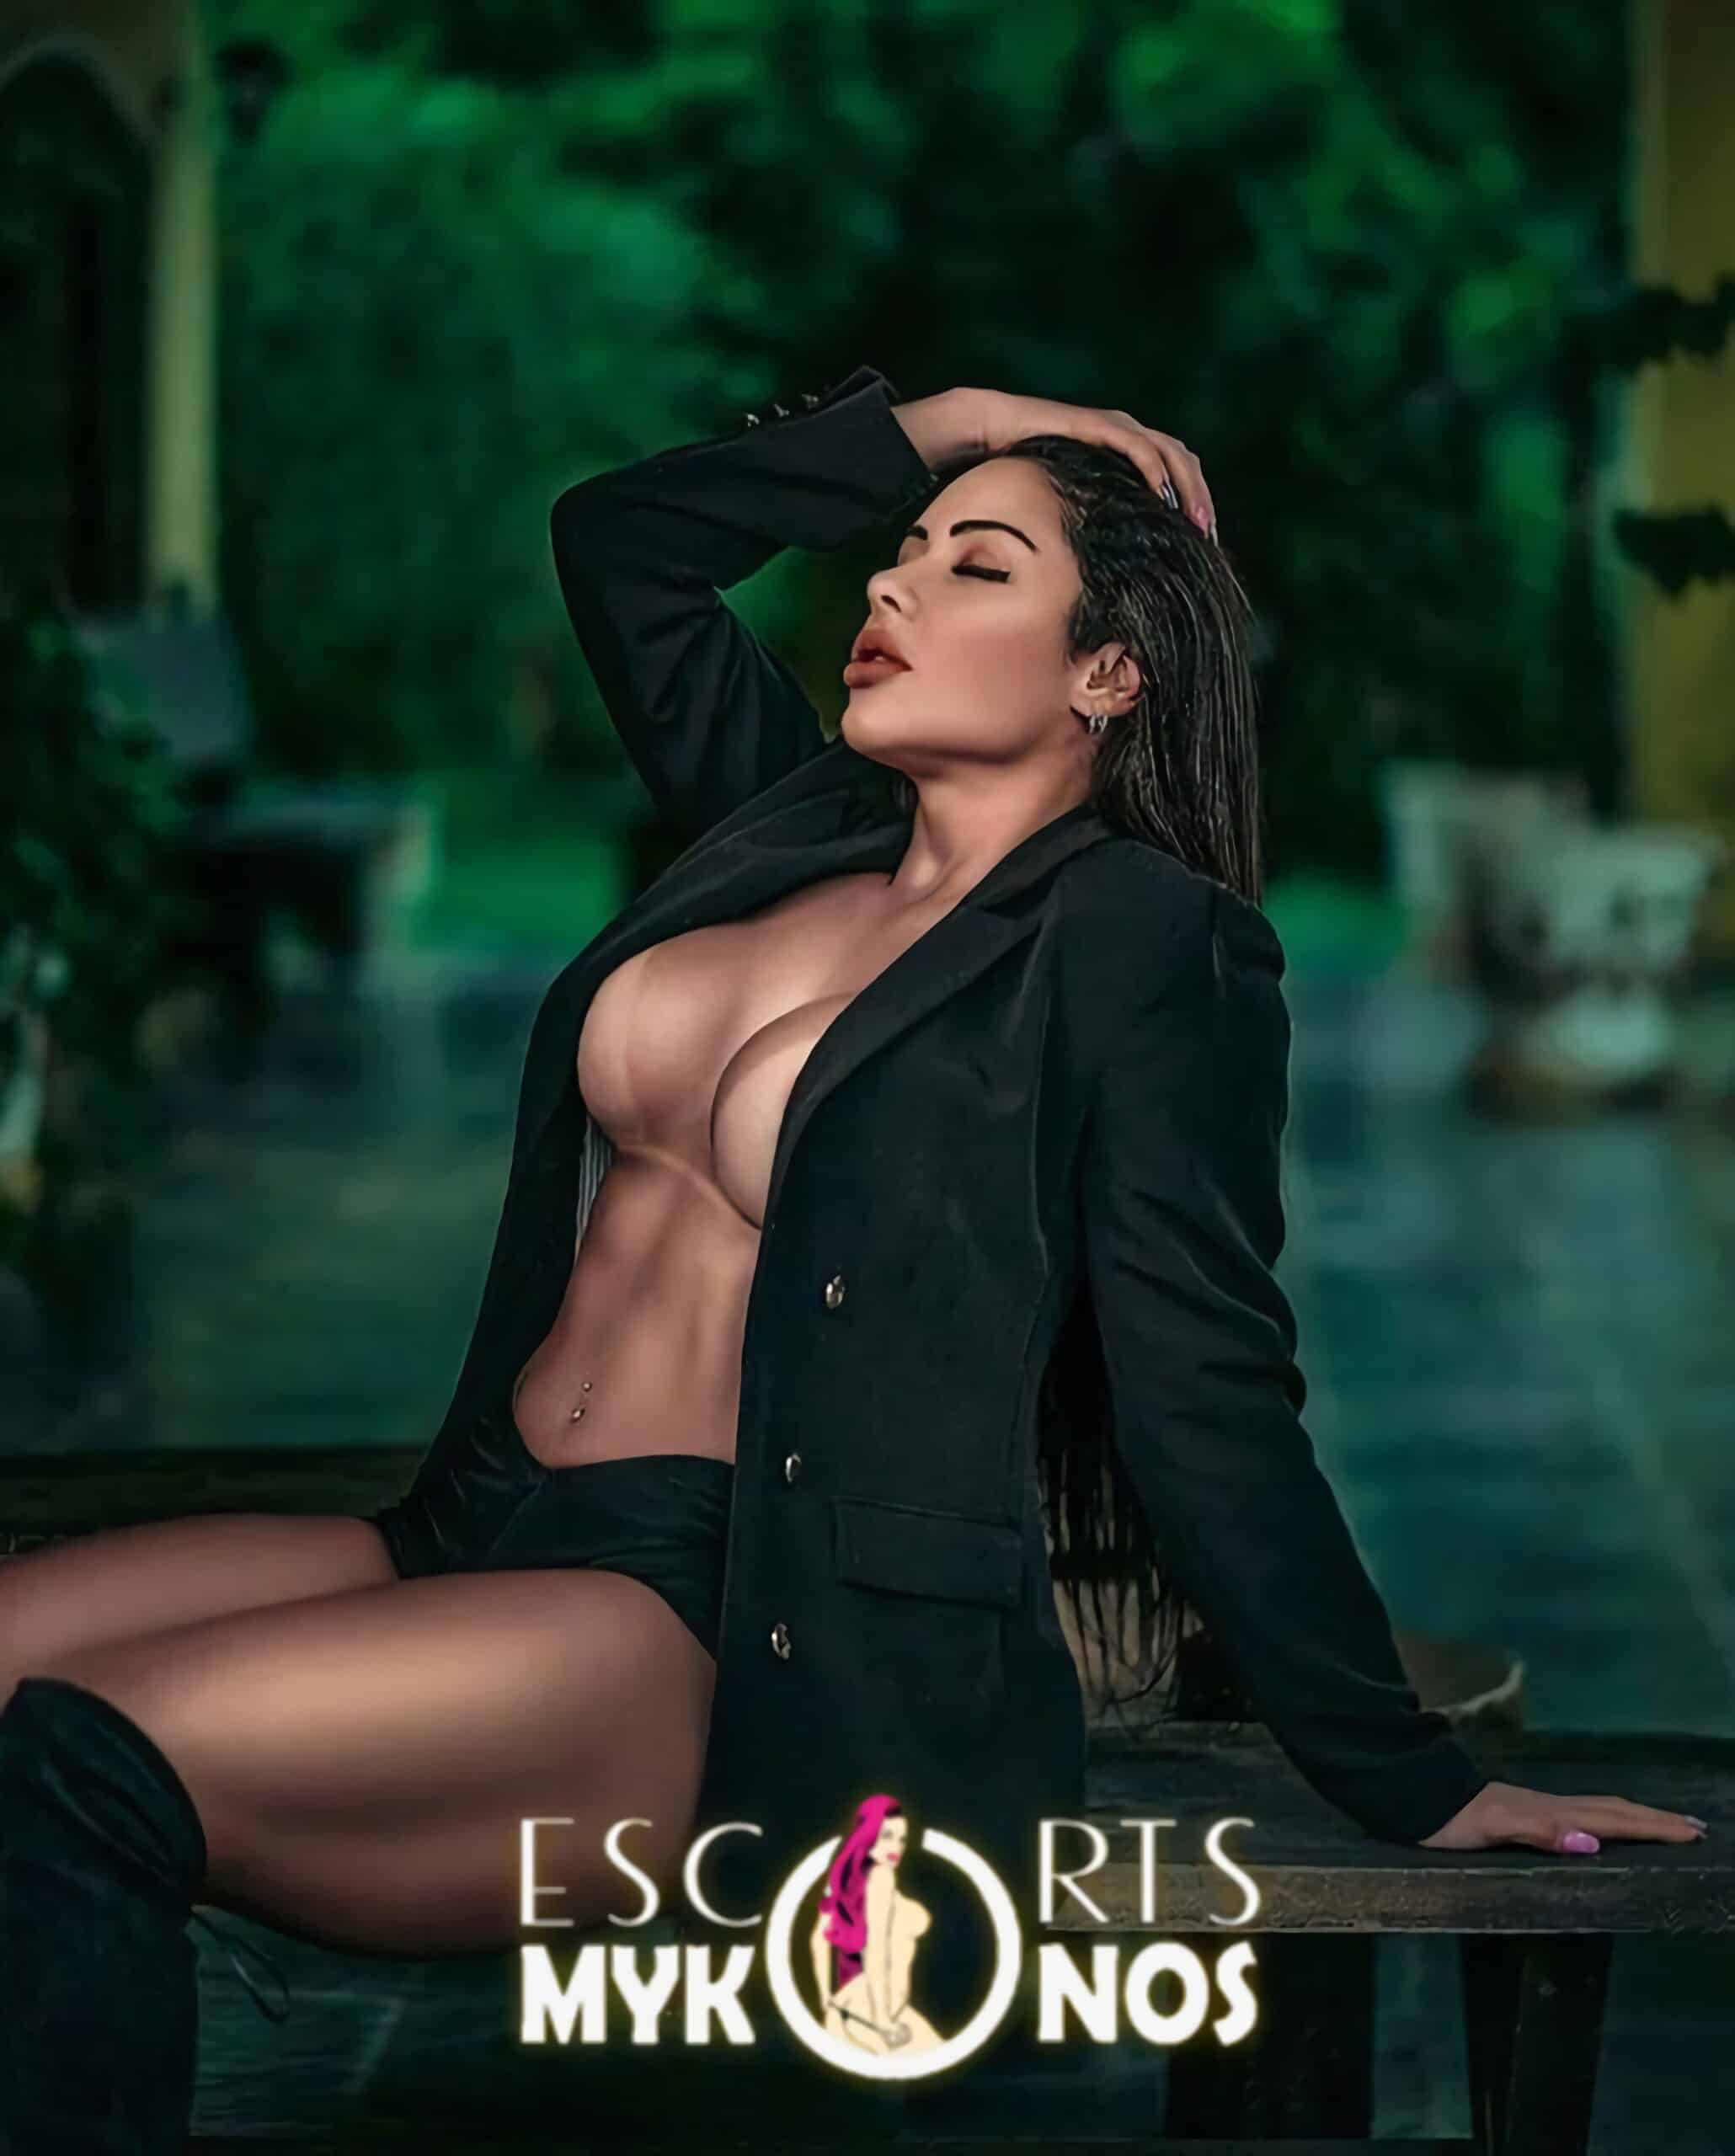 gisele ambrosio model escort